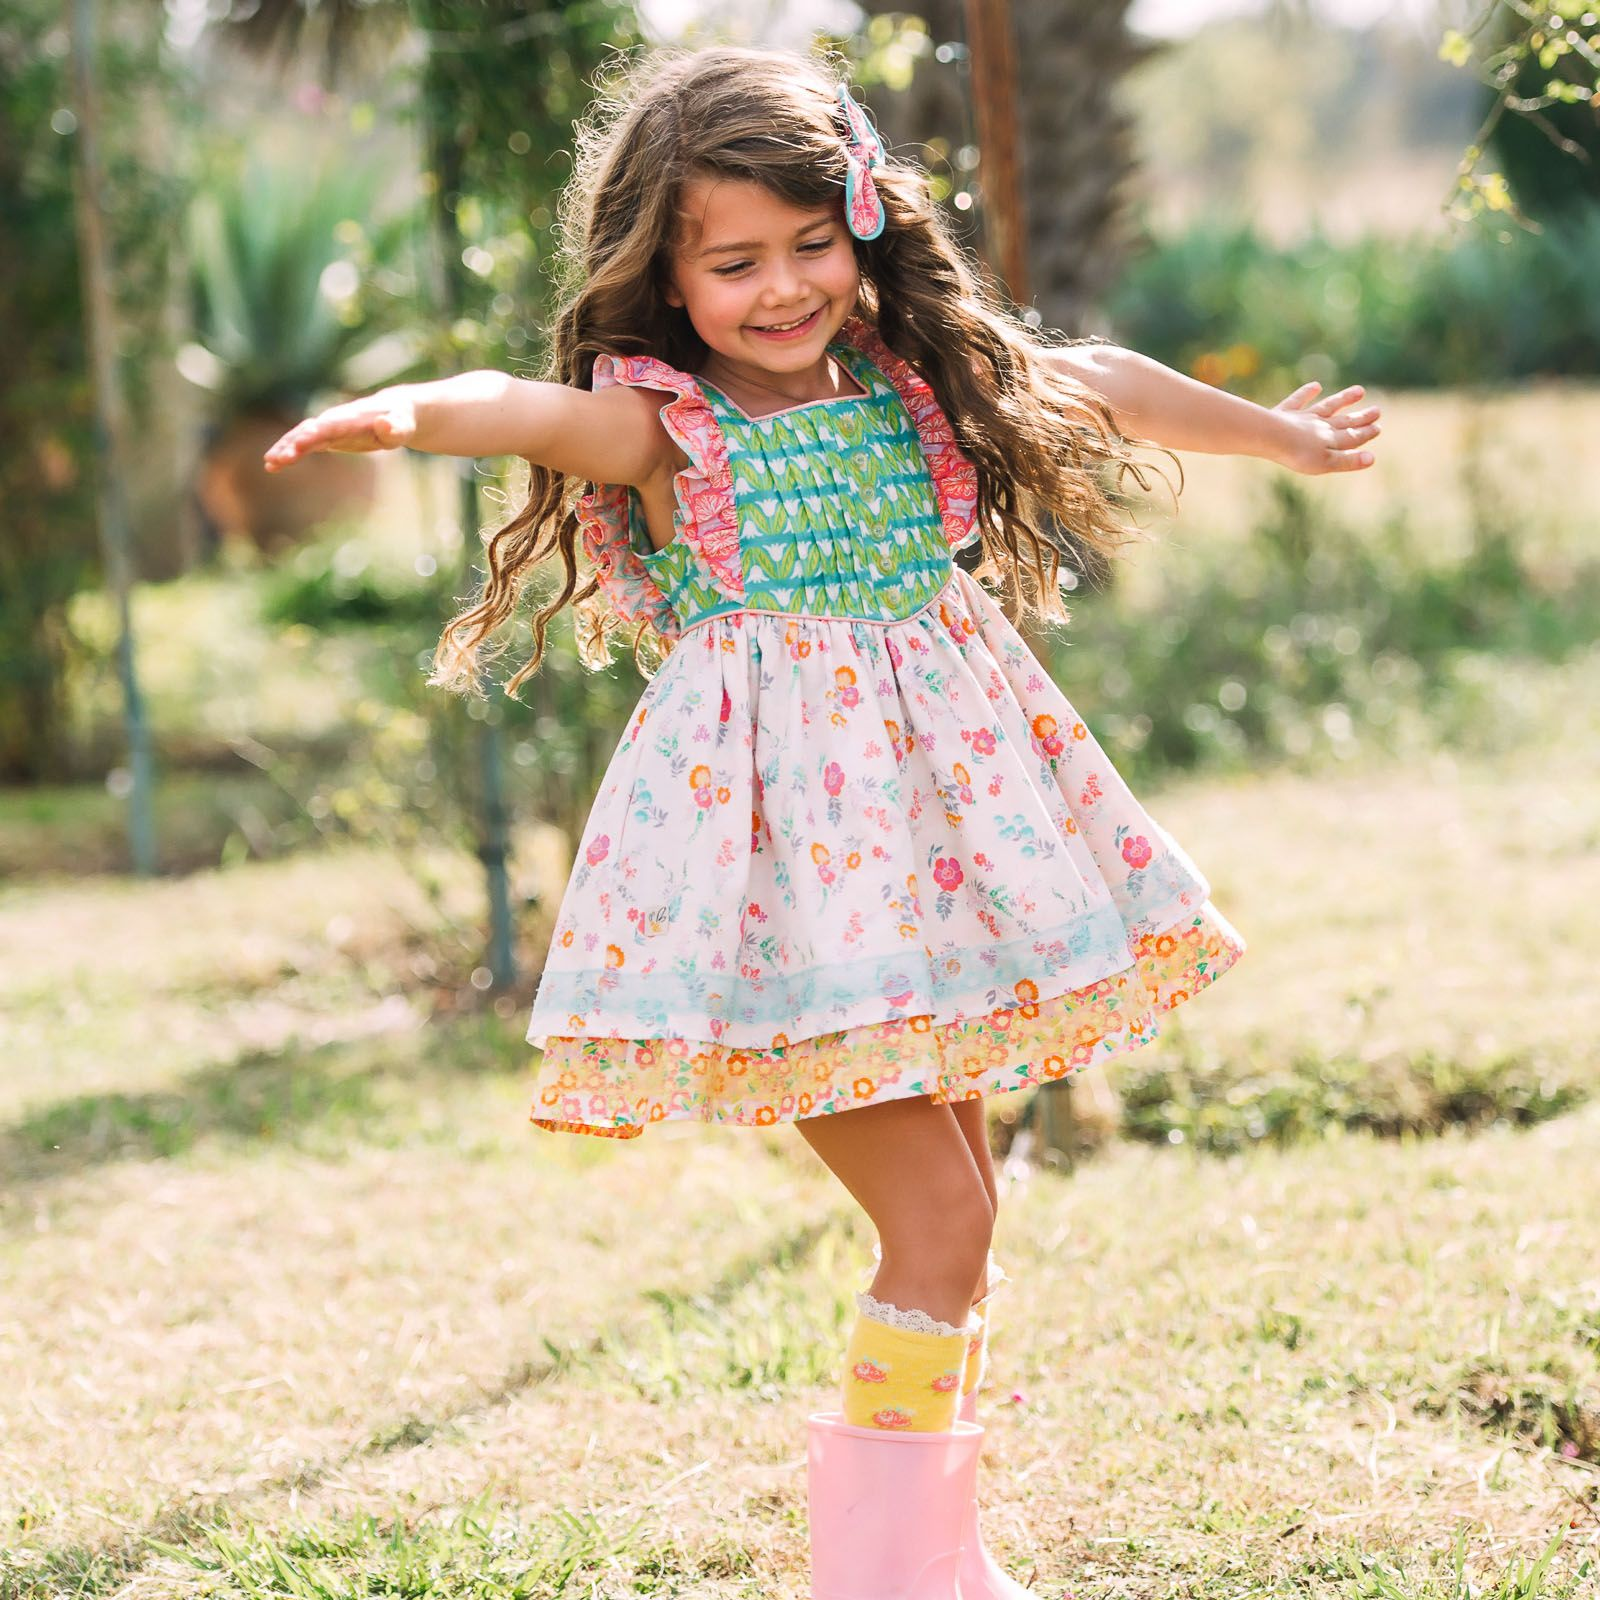 454212c8b2f Wildflowers Clothing~Best Day Ever R1~Fresh Cut Felicity and Posie Socks